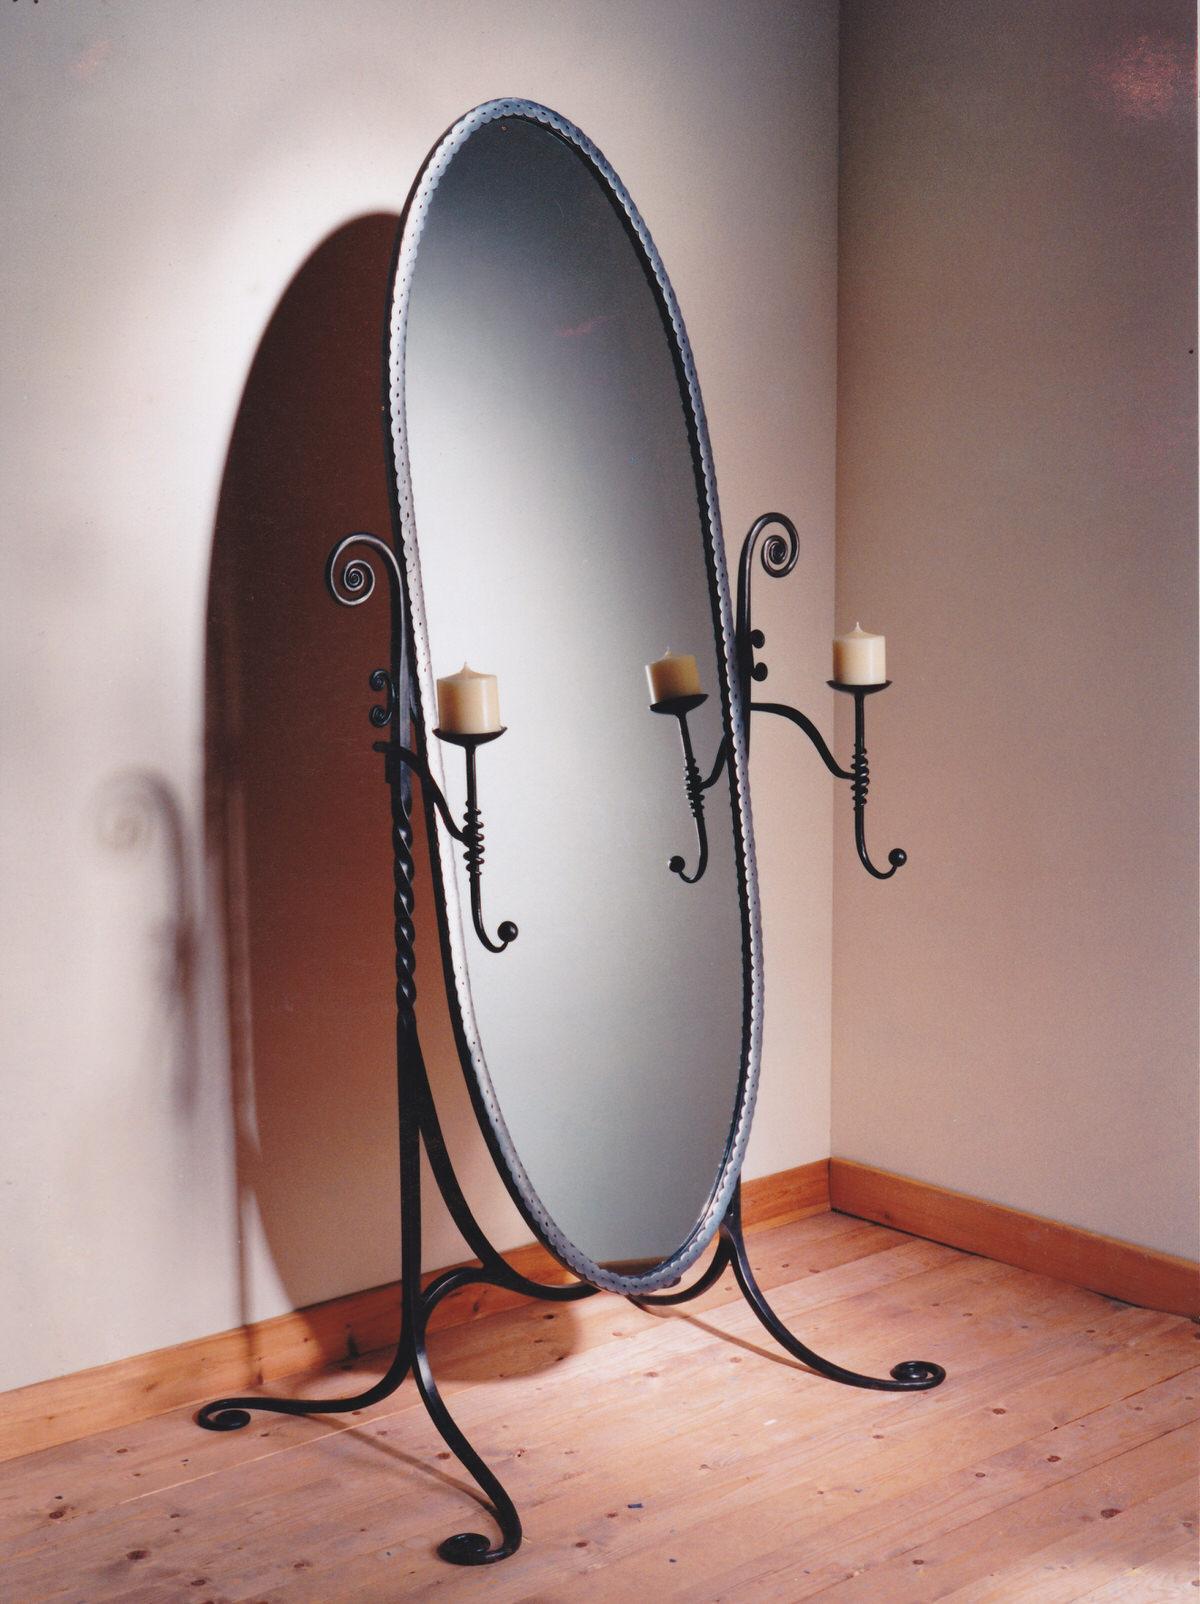 Cheval Mirror bespoke stunning designer mirror for interior designed bedroom furniture Decores USA New York by Mark Reed